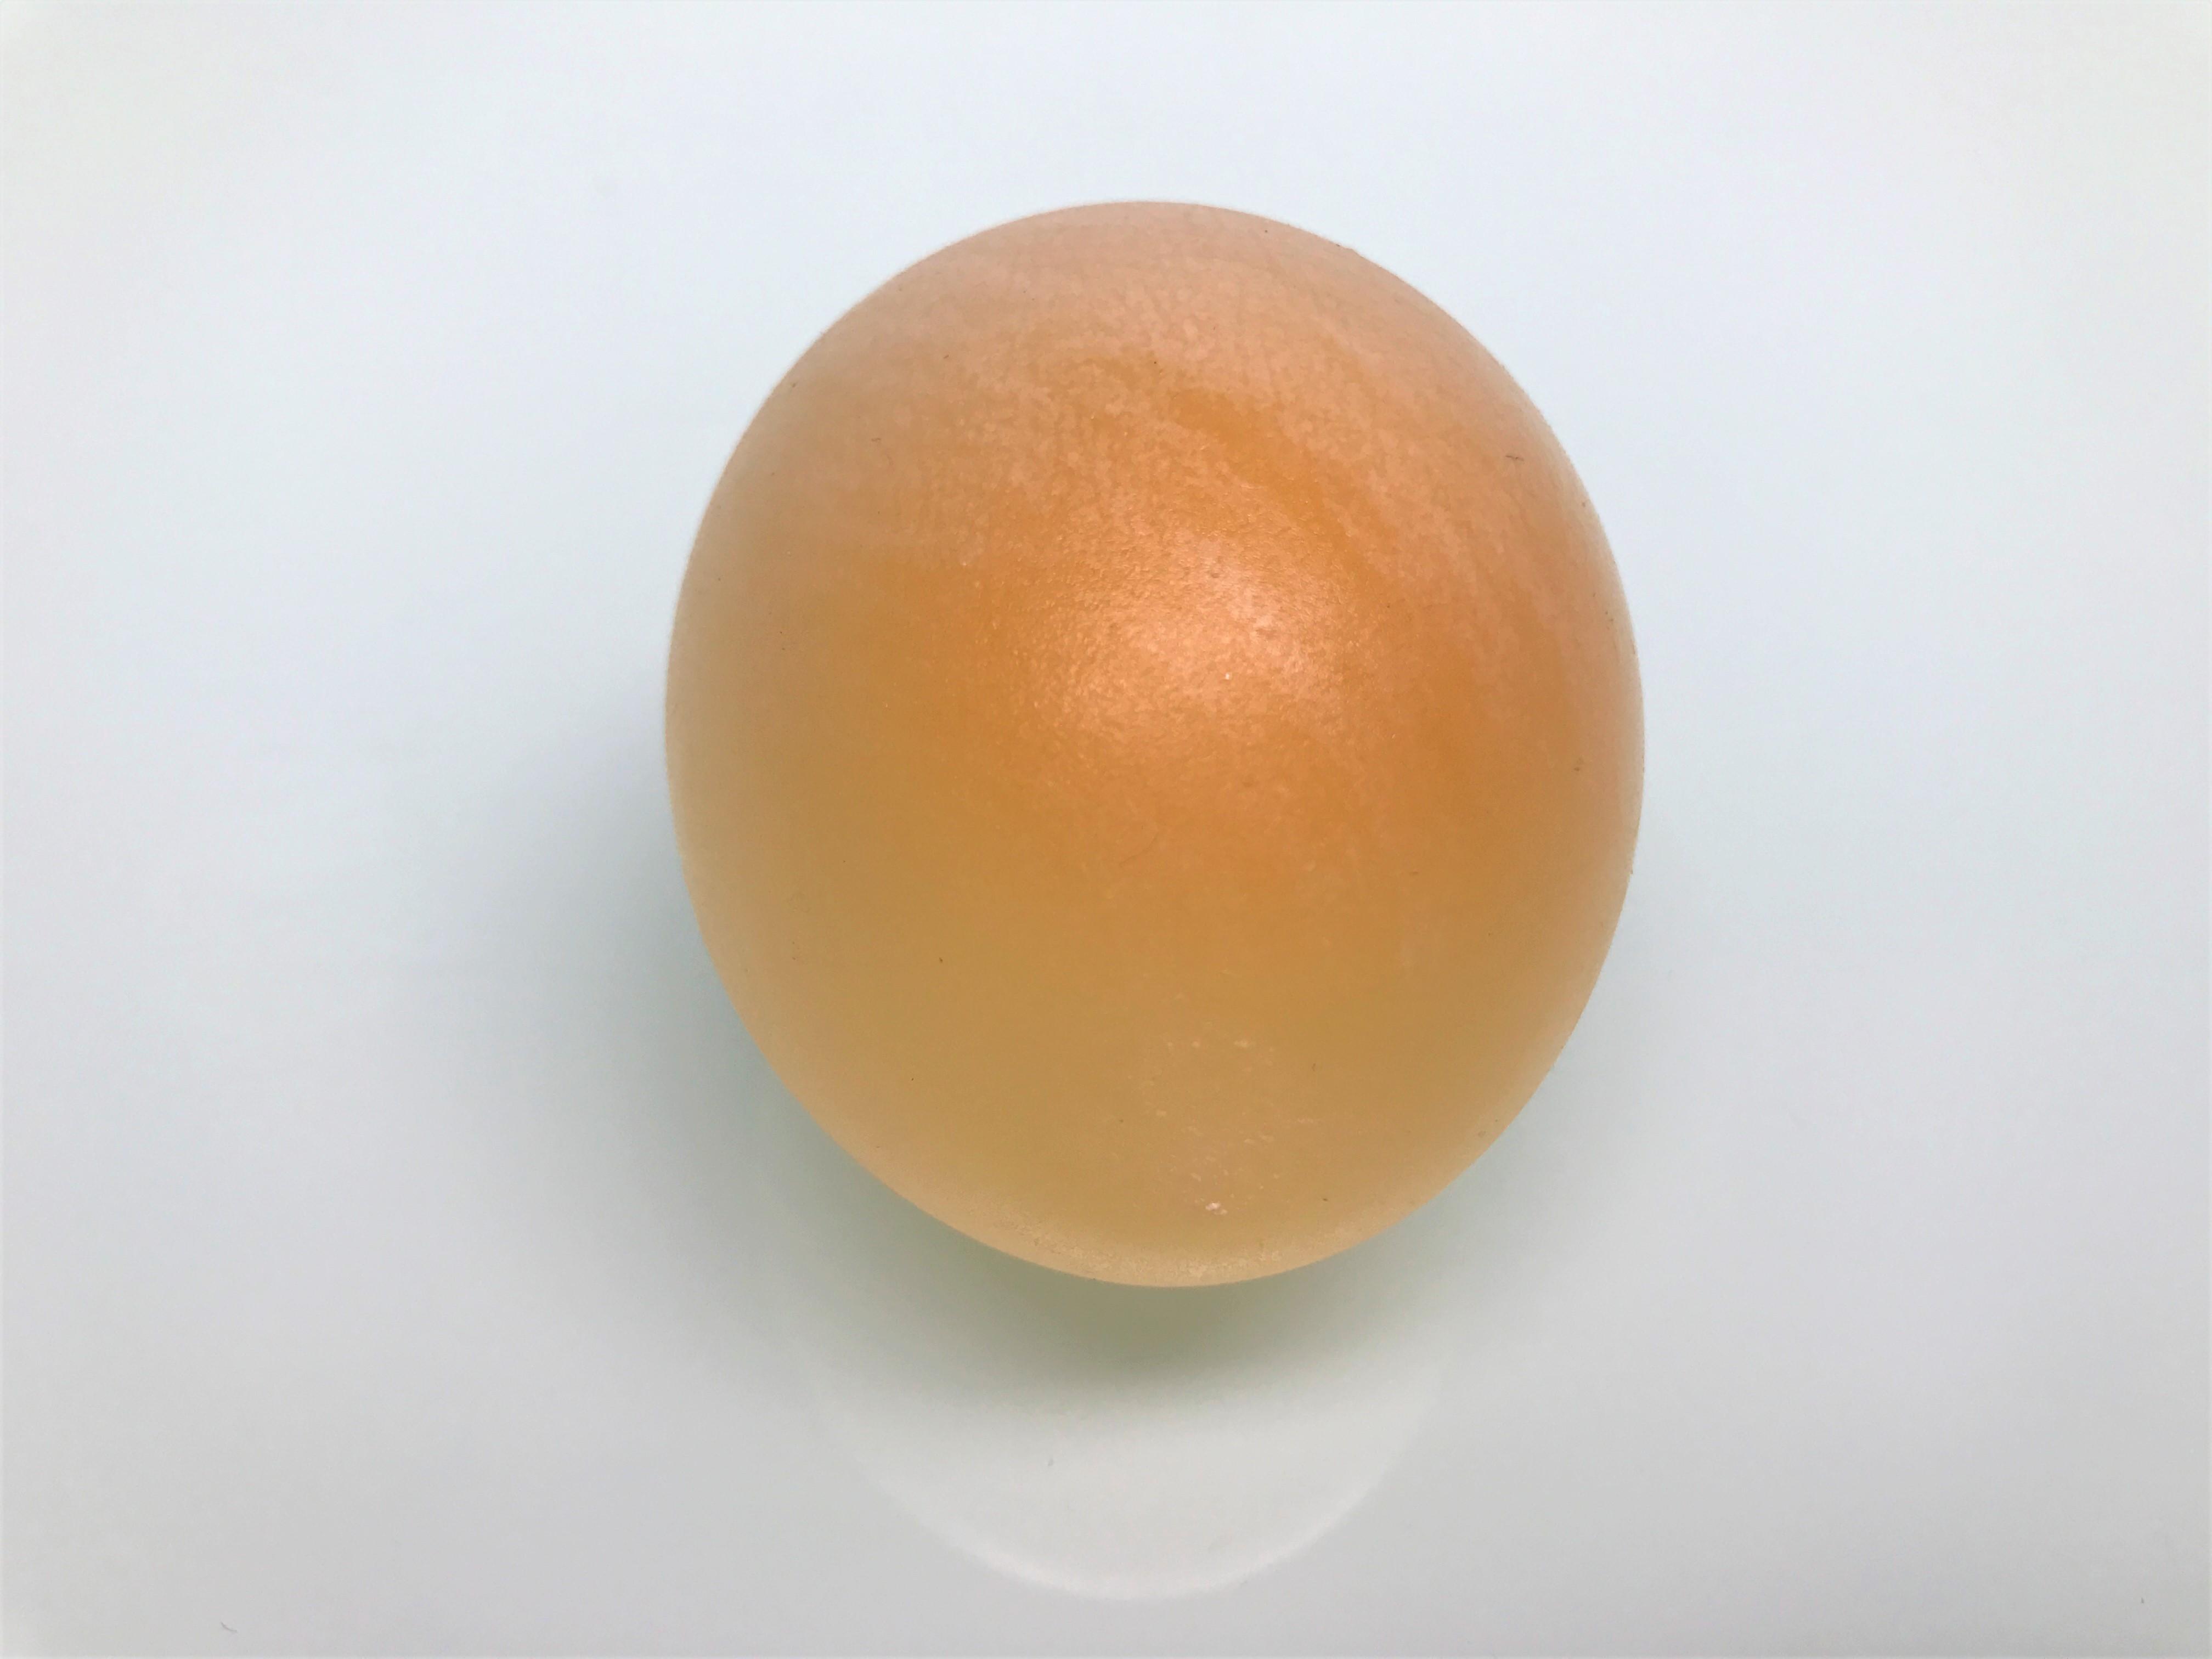 Pictures of eggs in vinegar